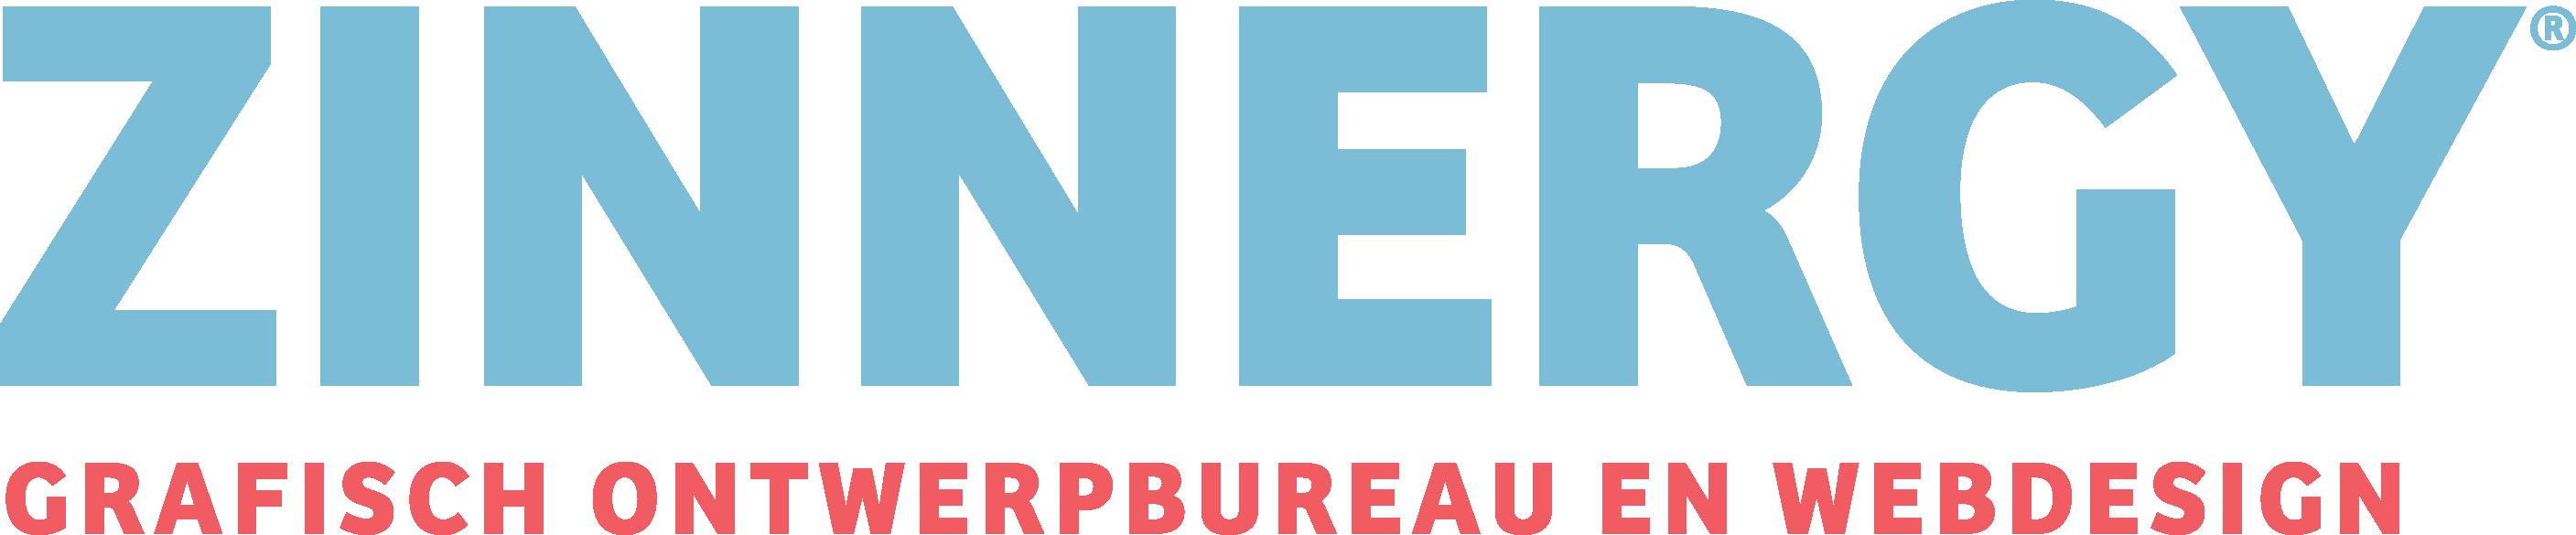 Zinnergy - Purpose Driven Creative Agency in Haarlem